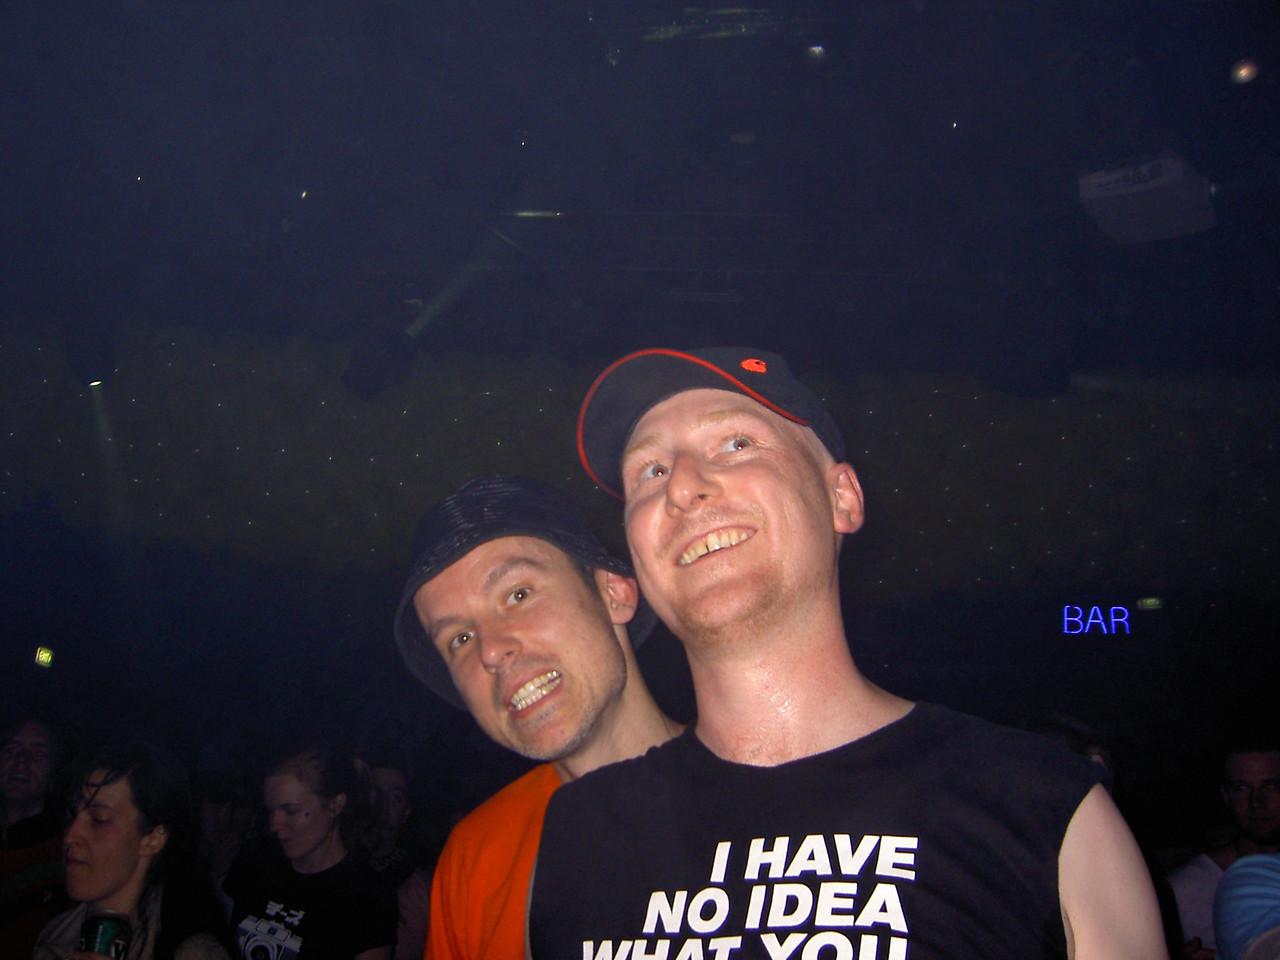 Danny and Stu